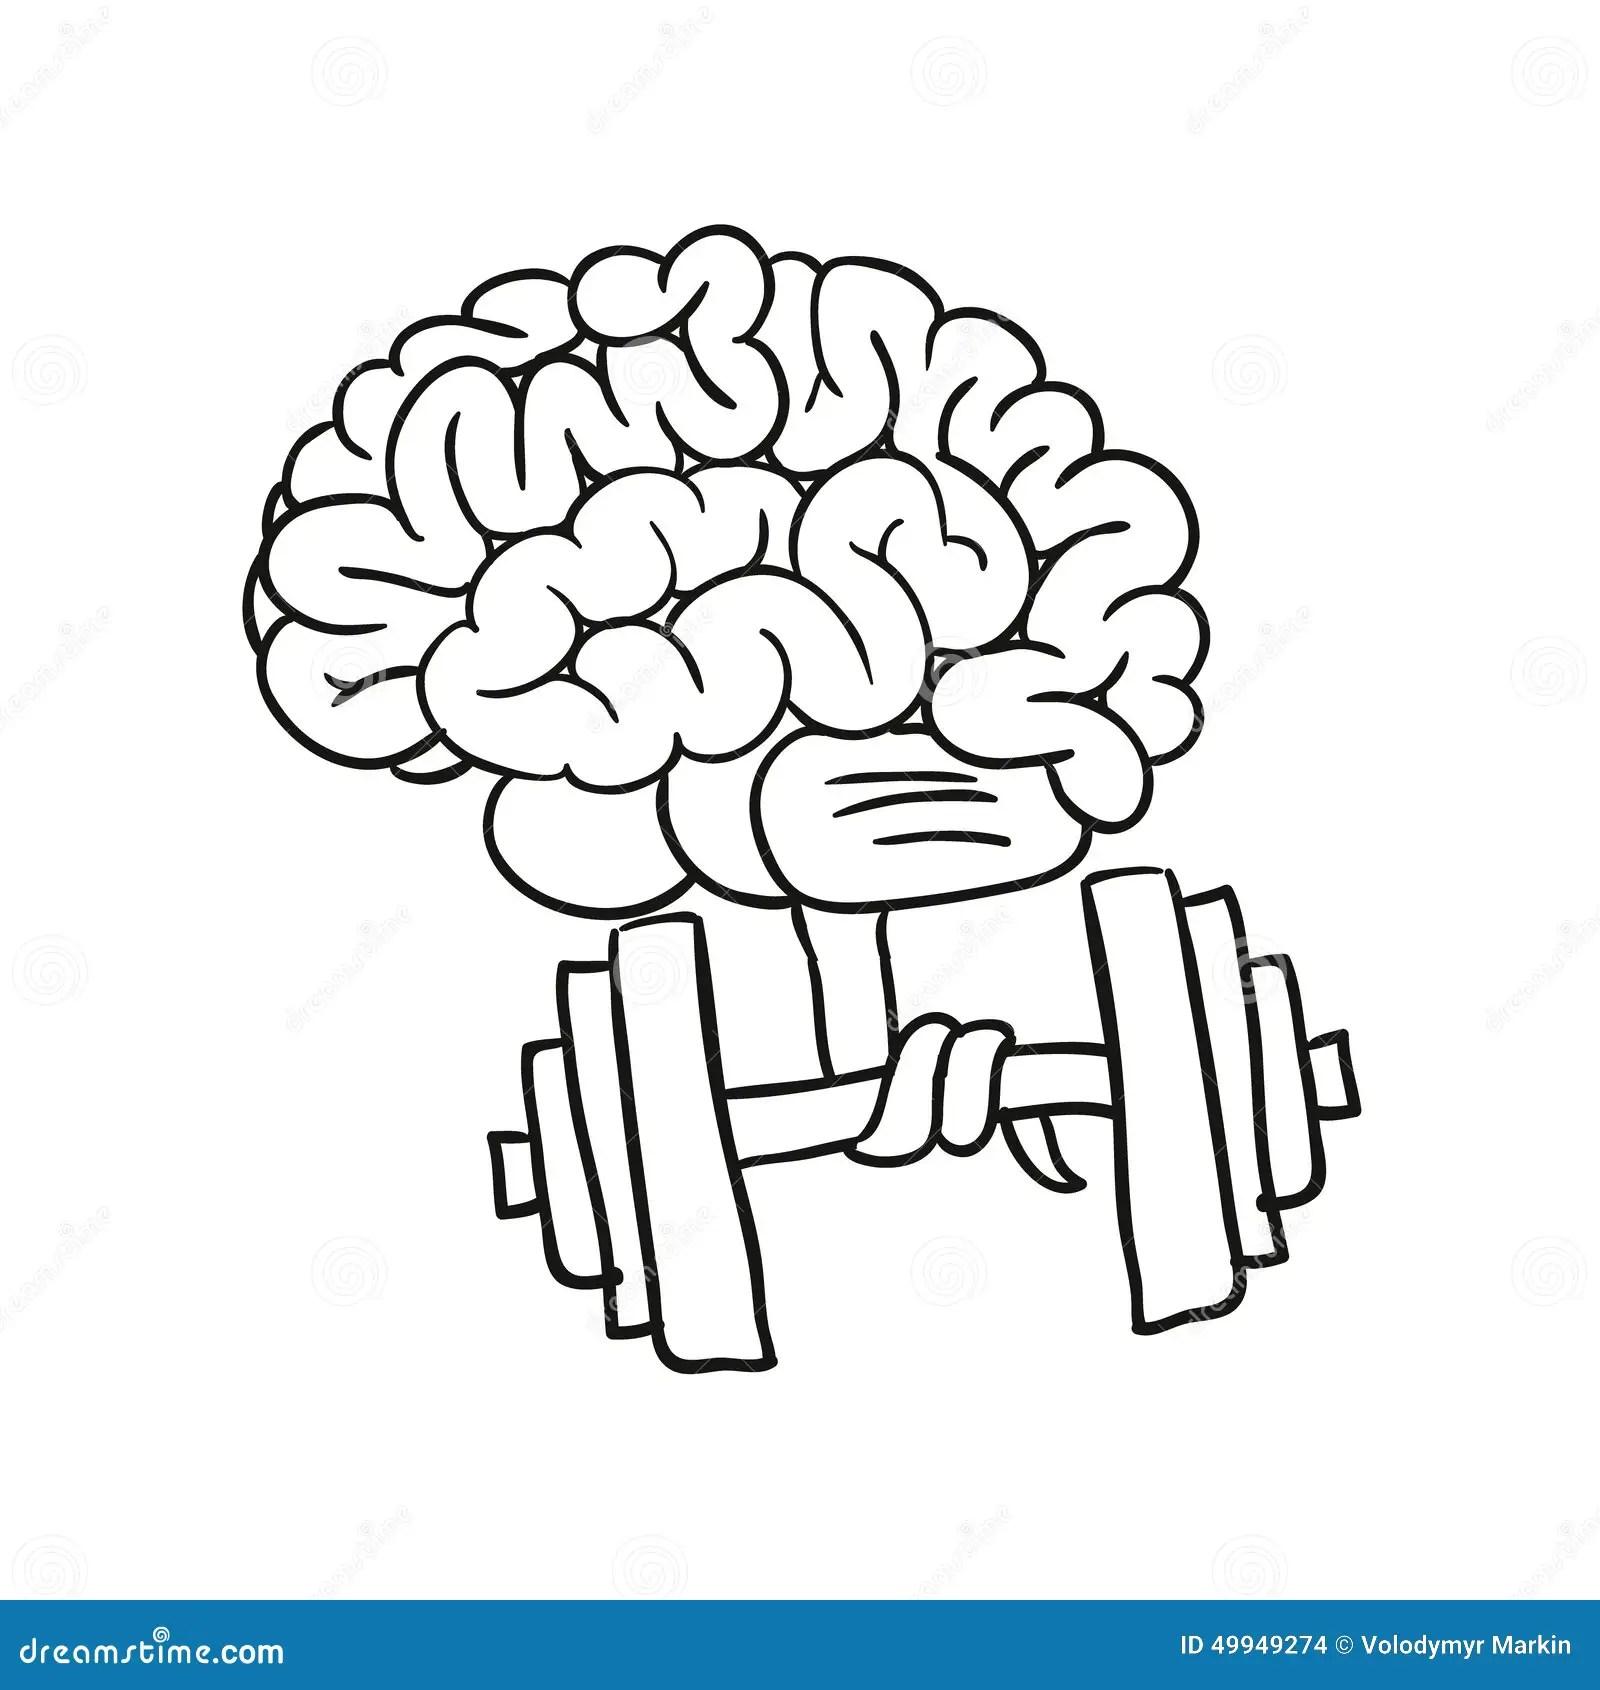 Gymnastics For The Mind Stock Illustration